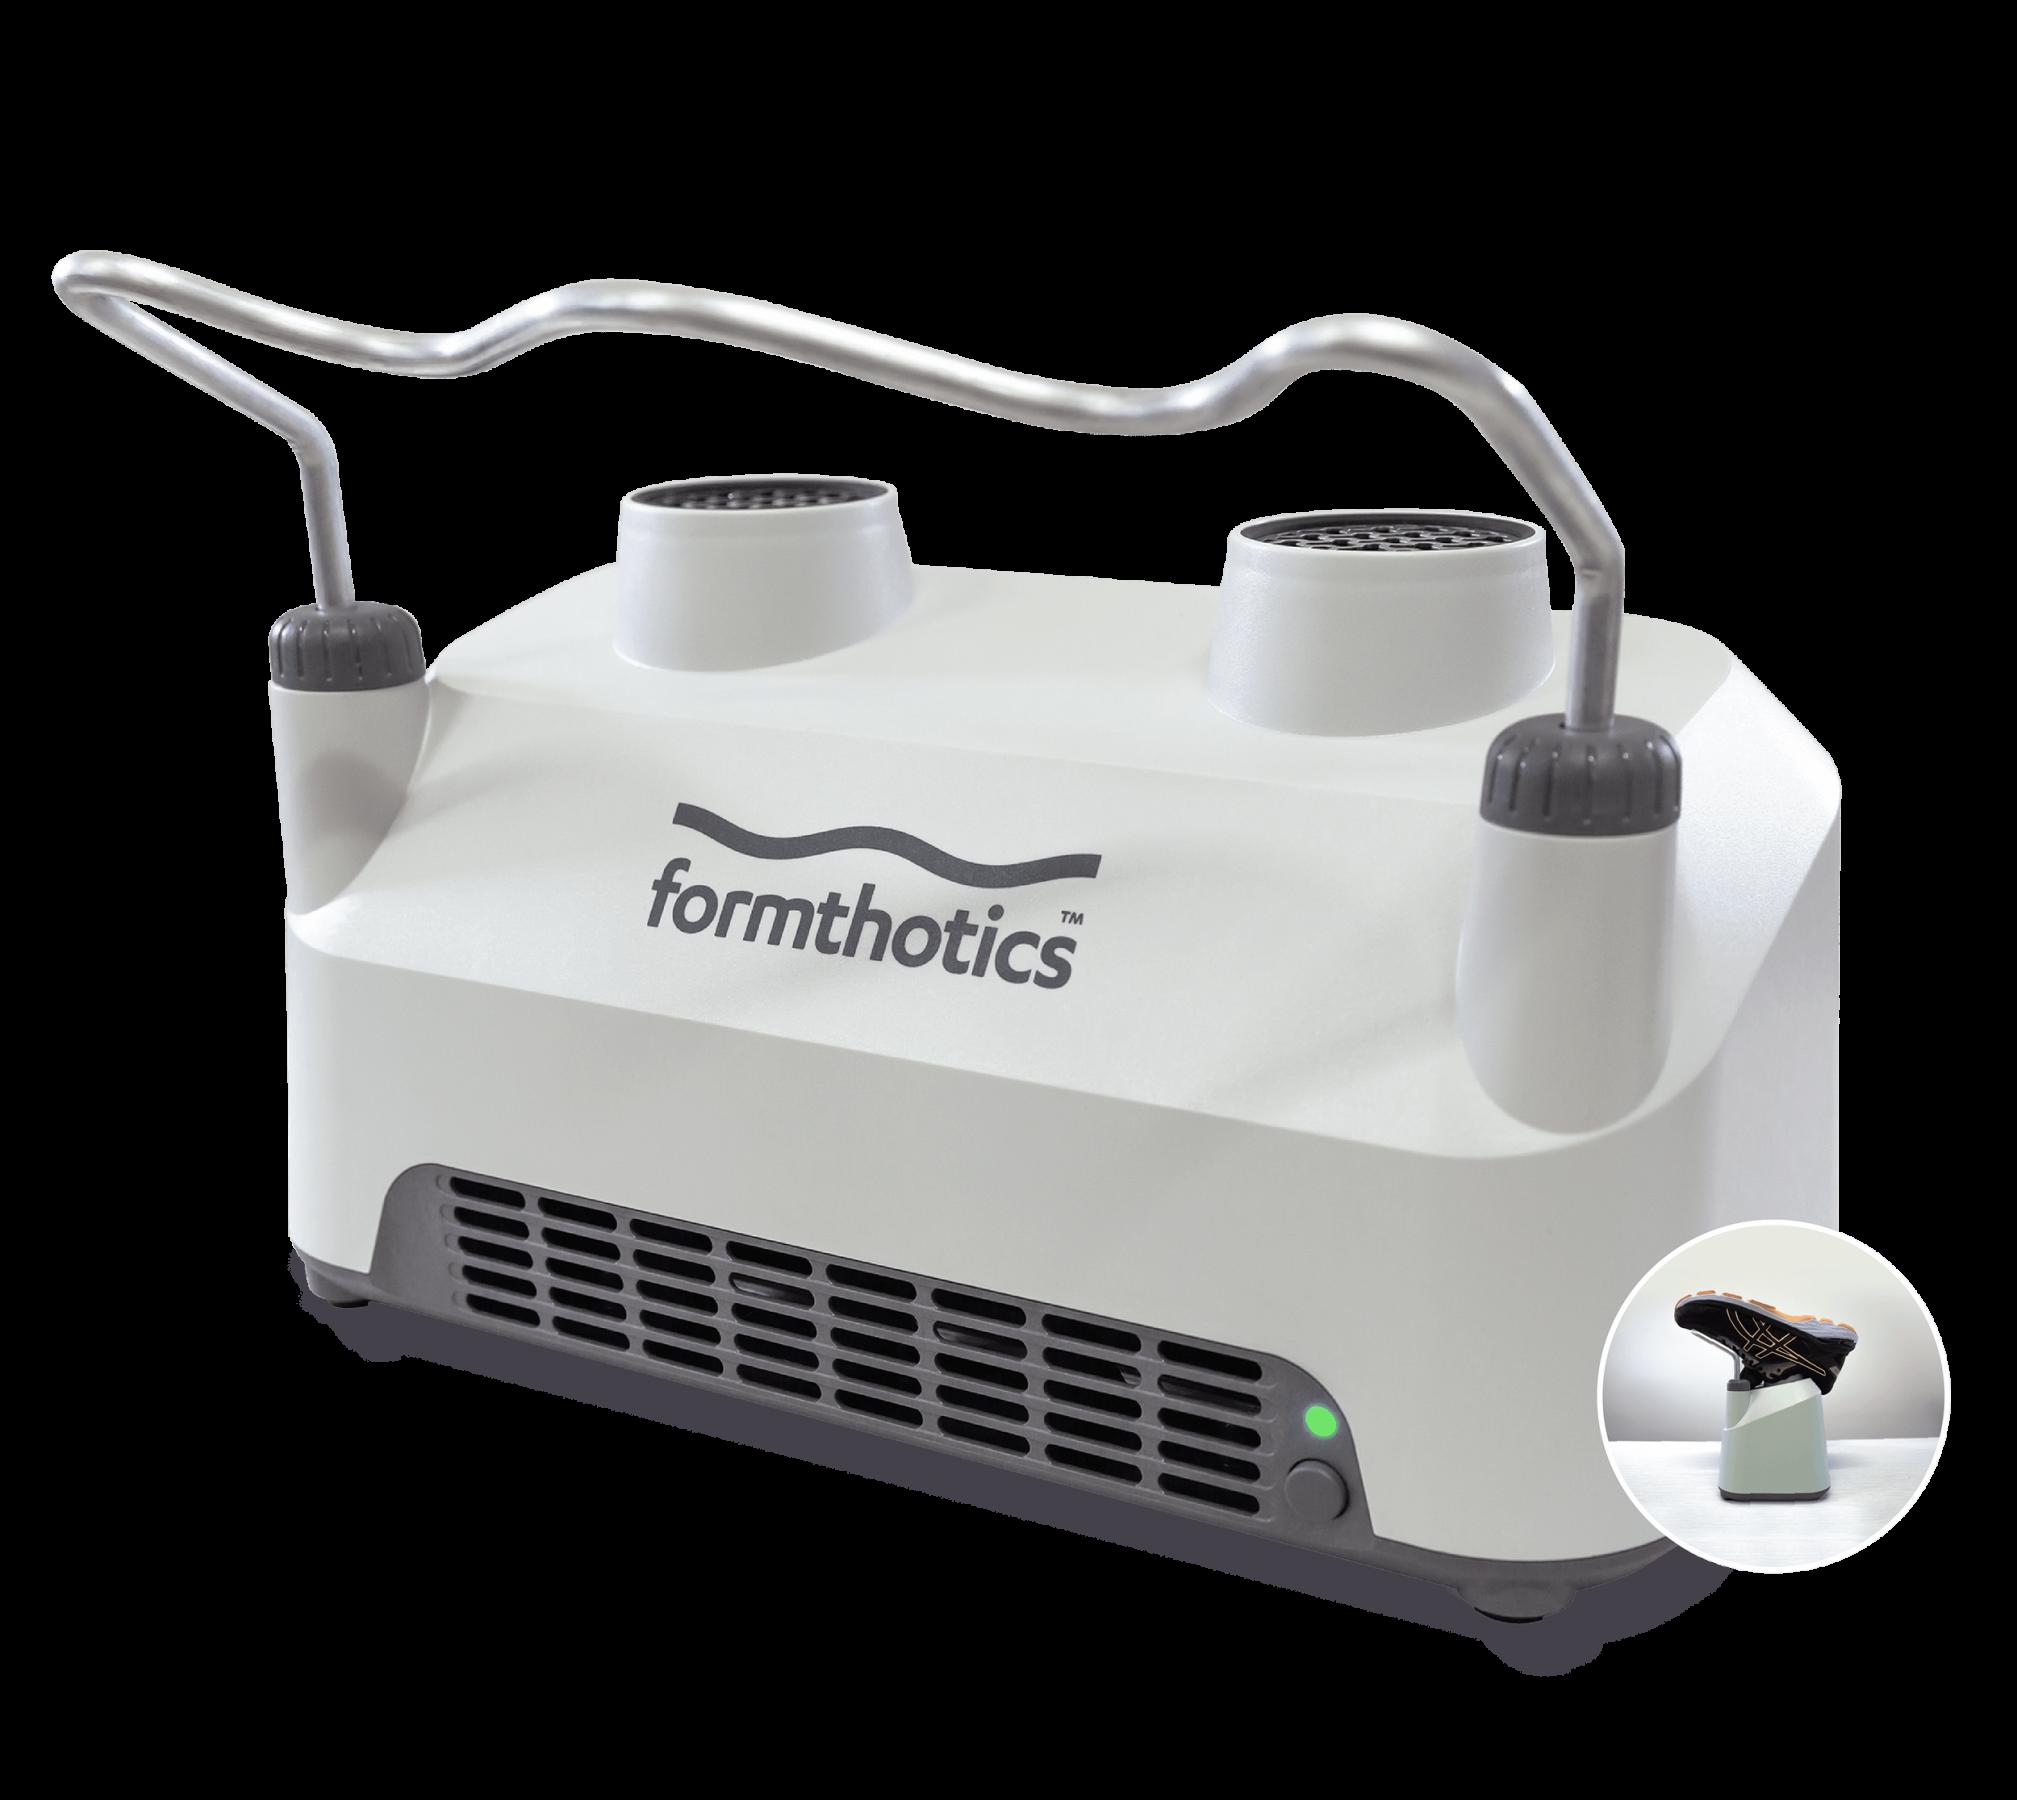 Formthotics Heater